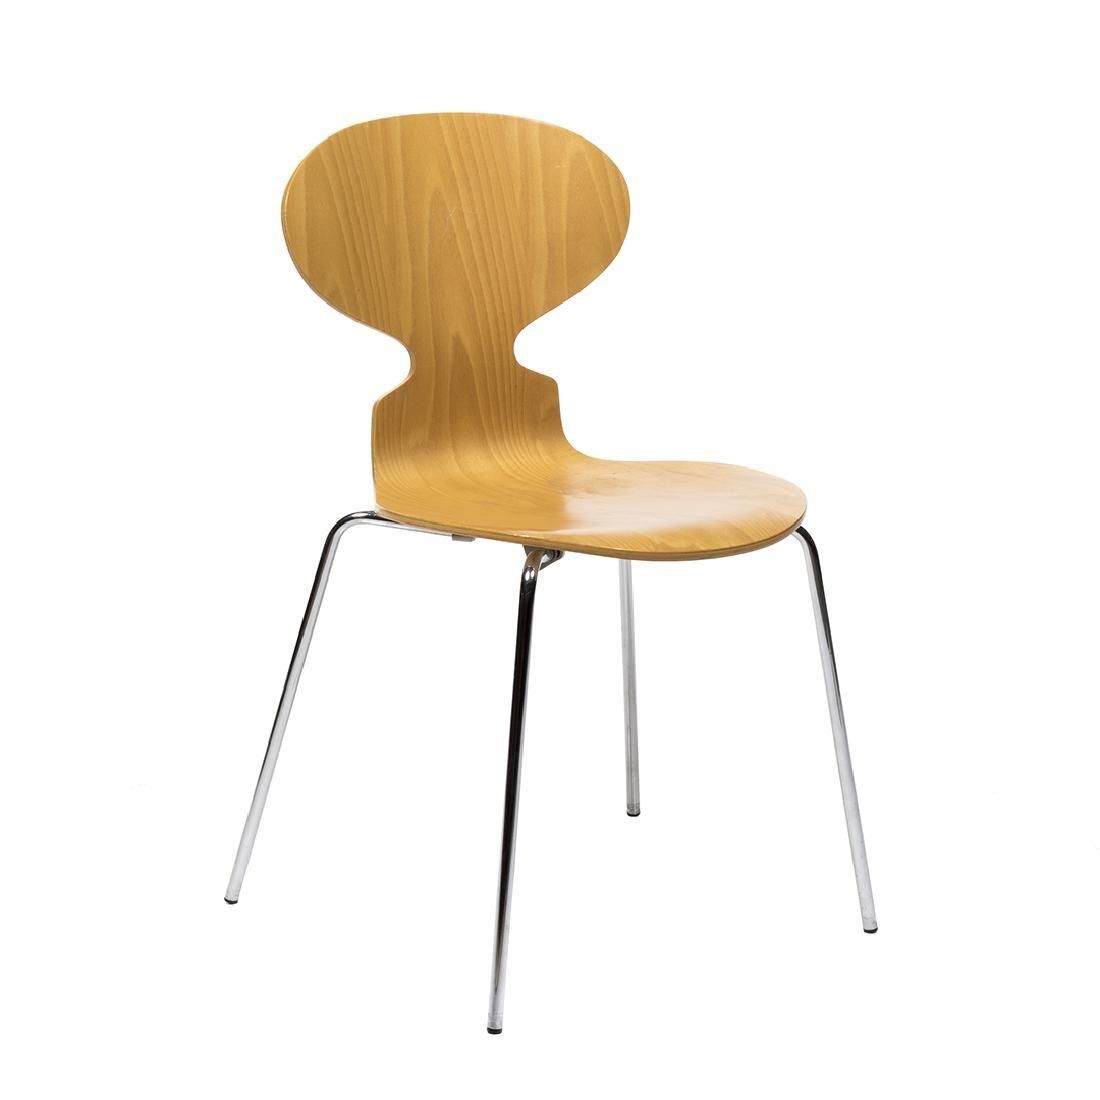 Arne Jacobsen Series 7 Chair - 2